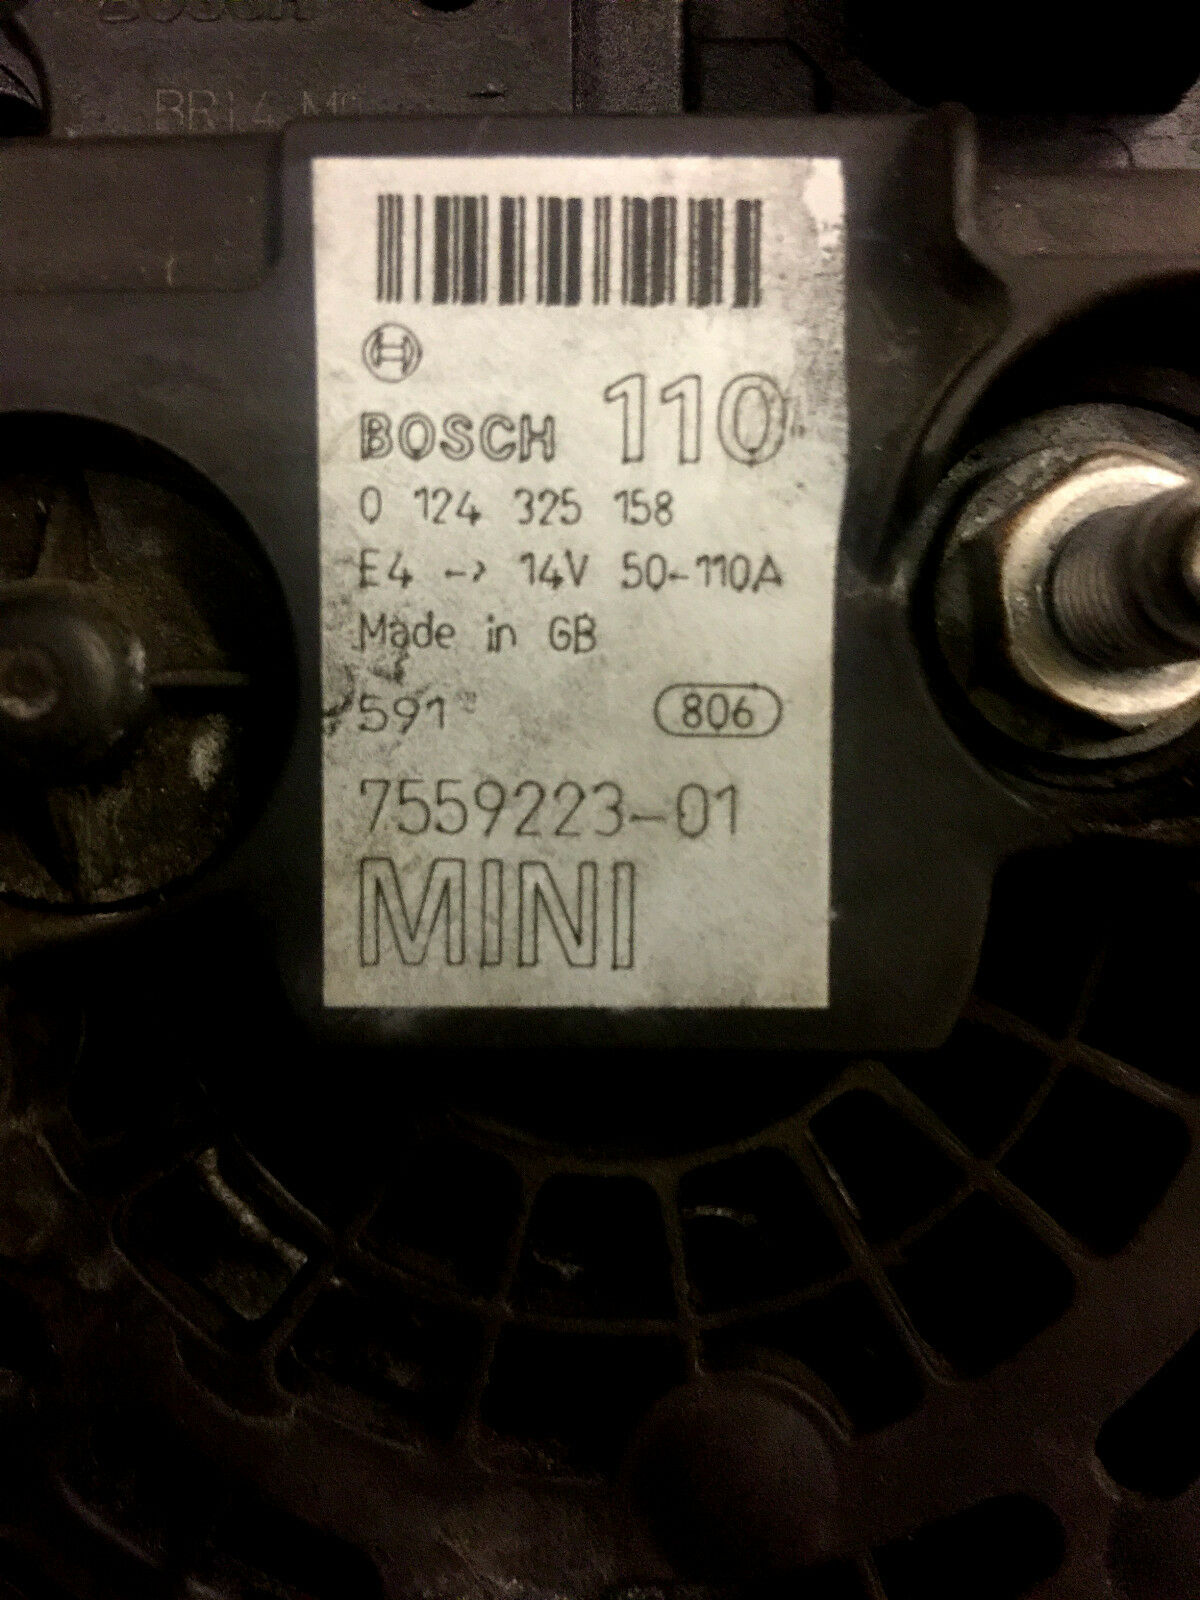 Part #: Bosch 7559223 BMW Mini One//Cooper R50//R52 Alternator 110 Amp NOT S